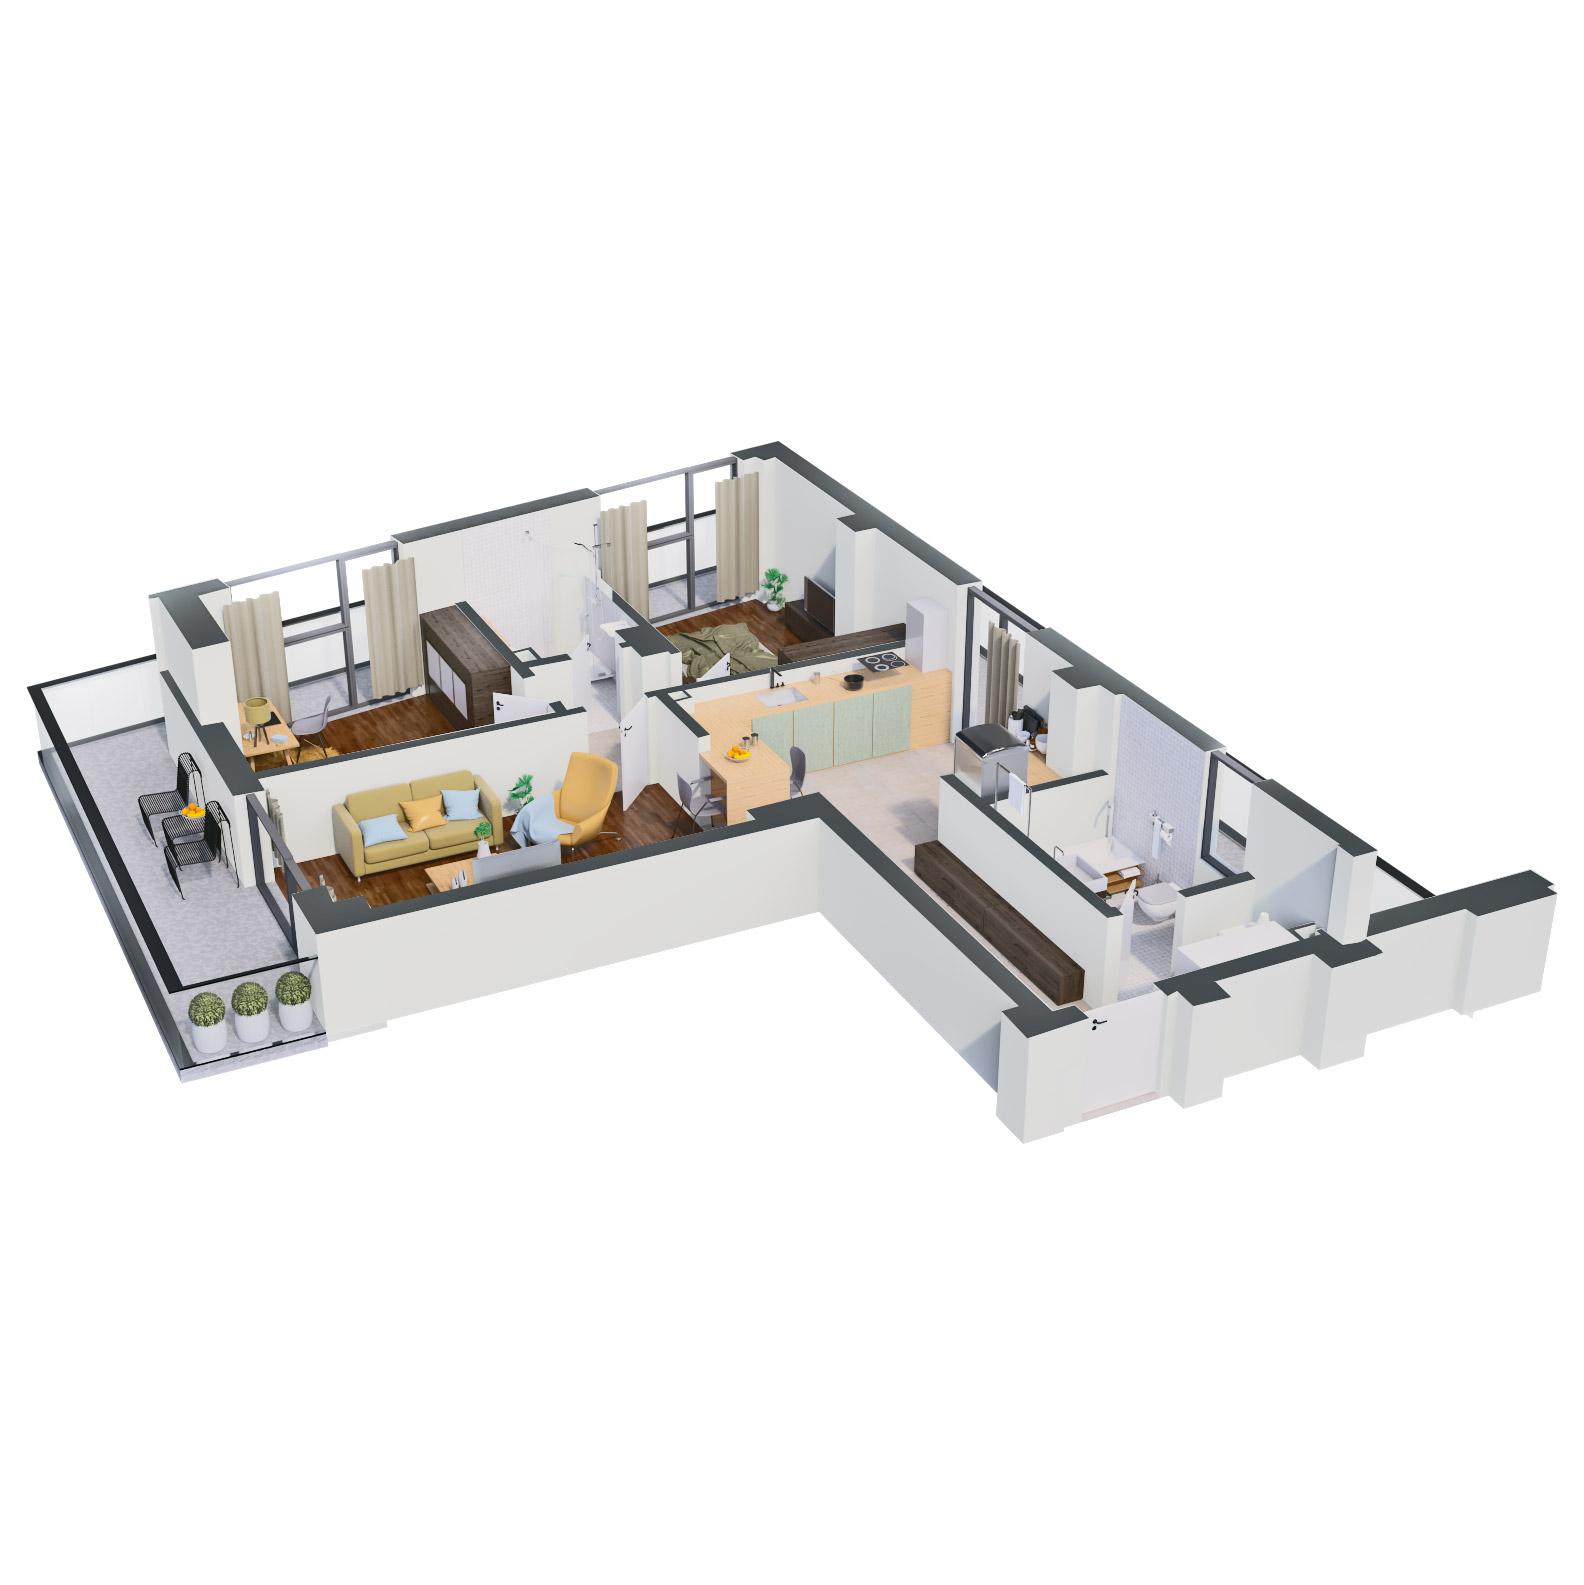 Apartament 3 camere de vanzare Bucuresti - Catedral Residence - Marriott, Piata Unirii, 13 Septembrie, Izvor - Tip 1 - T1 - B